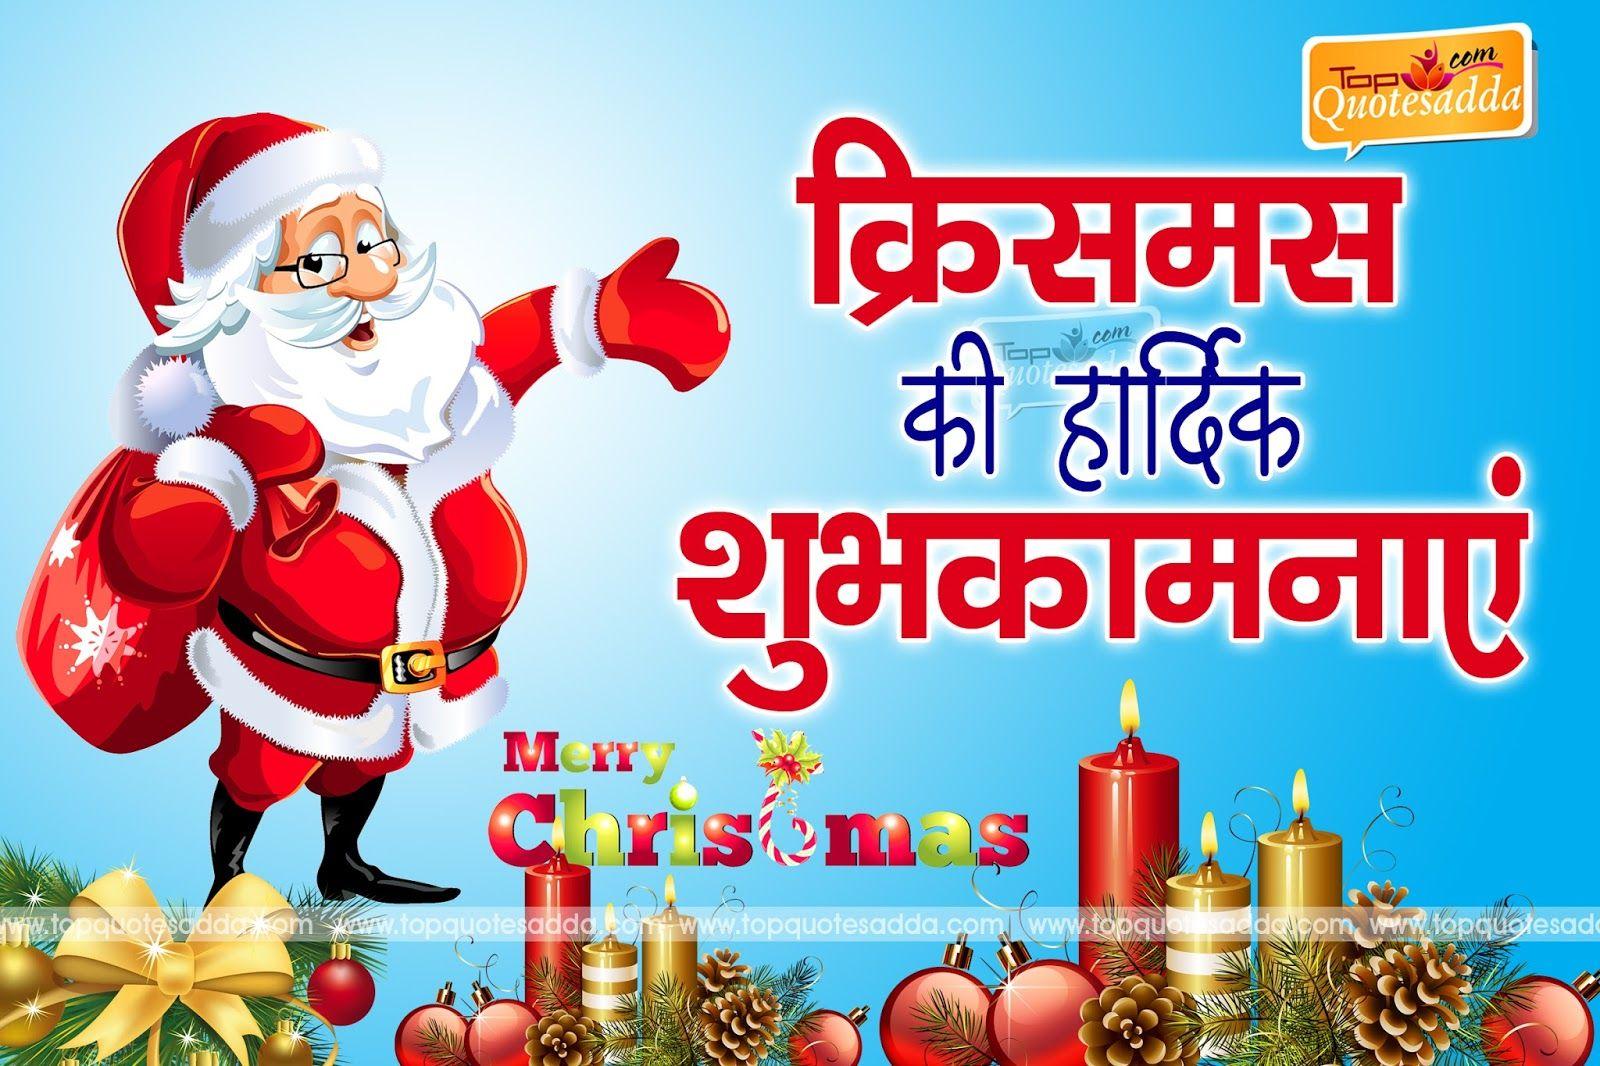 happy christmas hindi greetings images,merry christmas